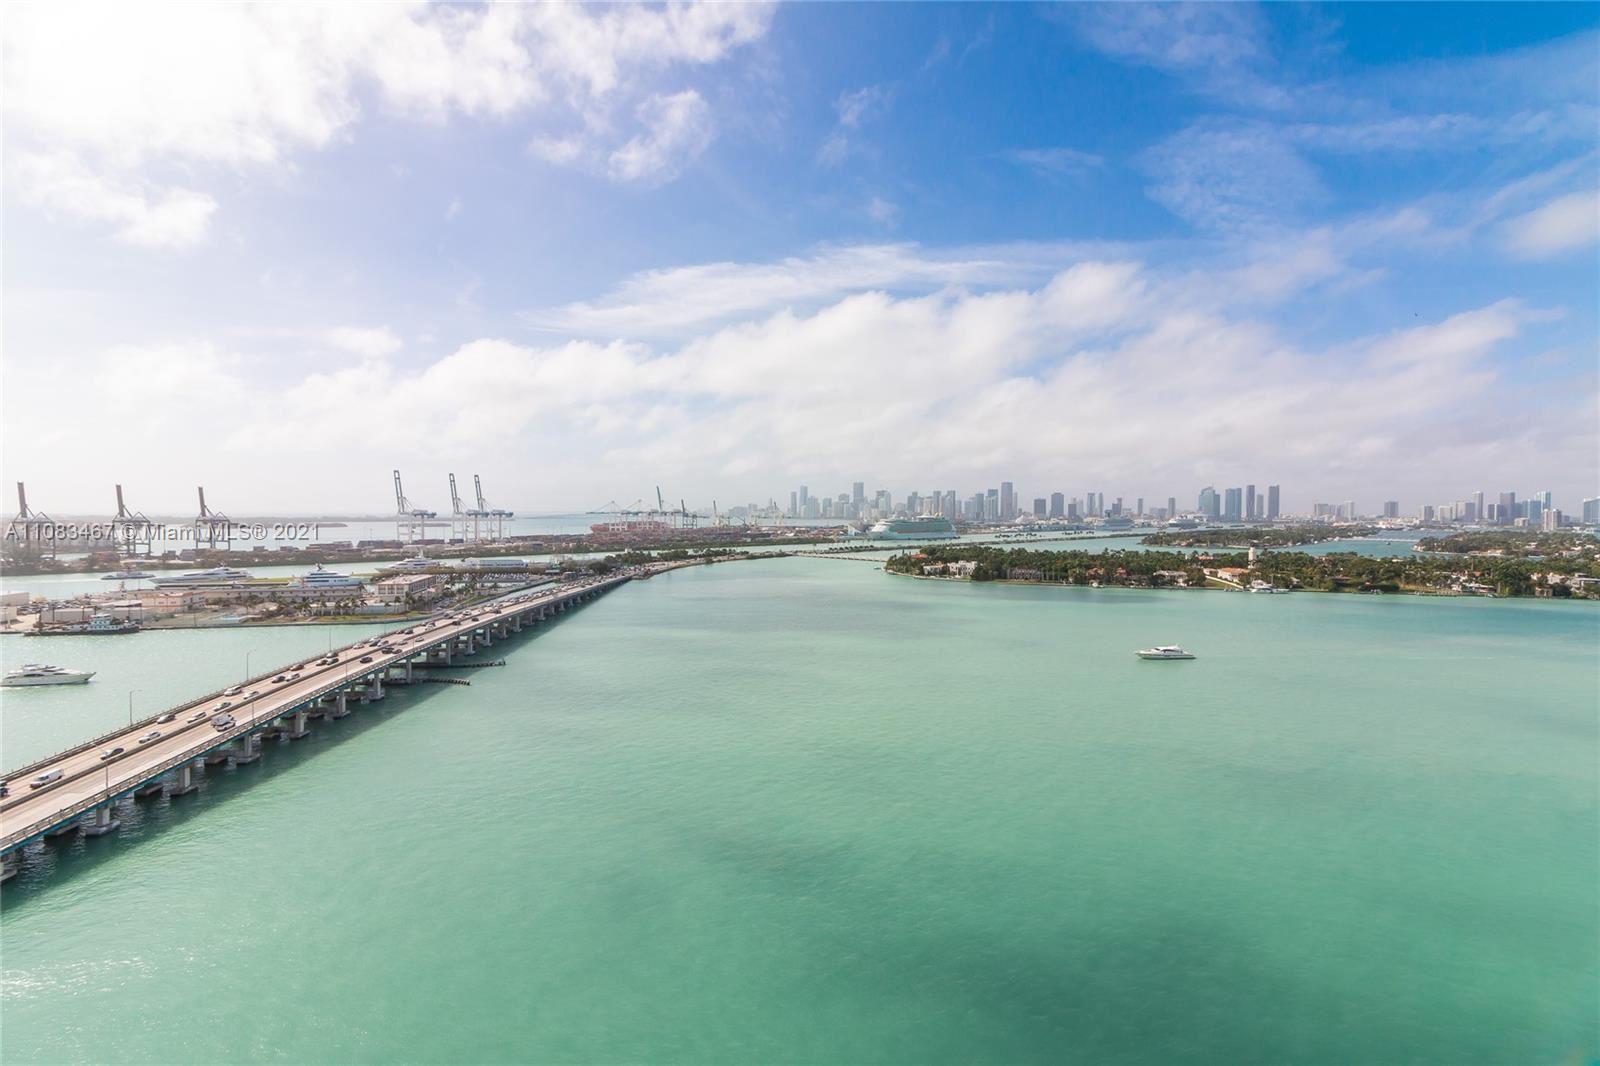 540 West Ave #2211, Miami Beach, FL 33139 - #: A11083467